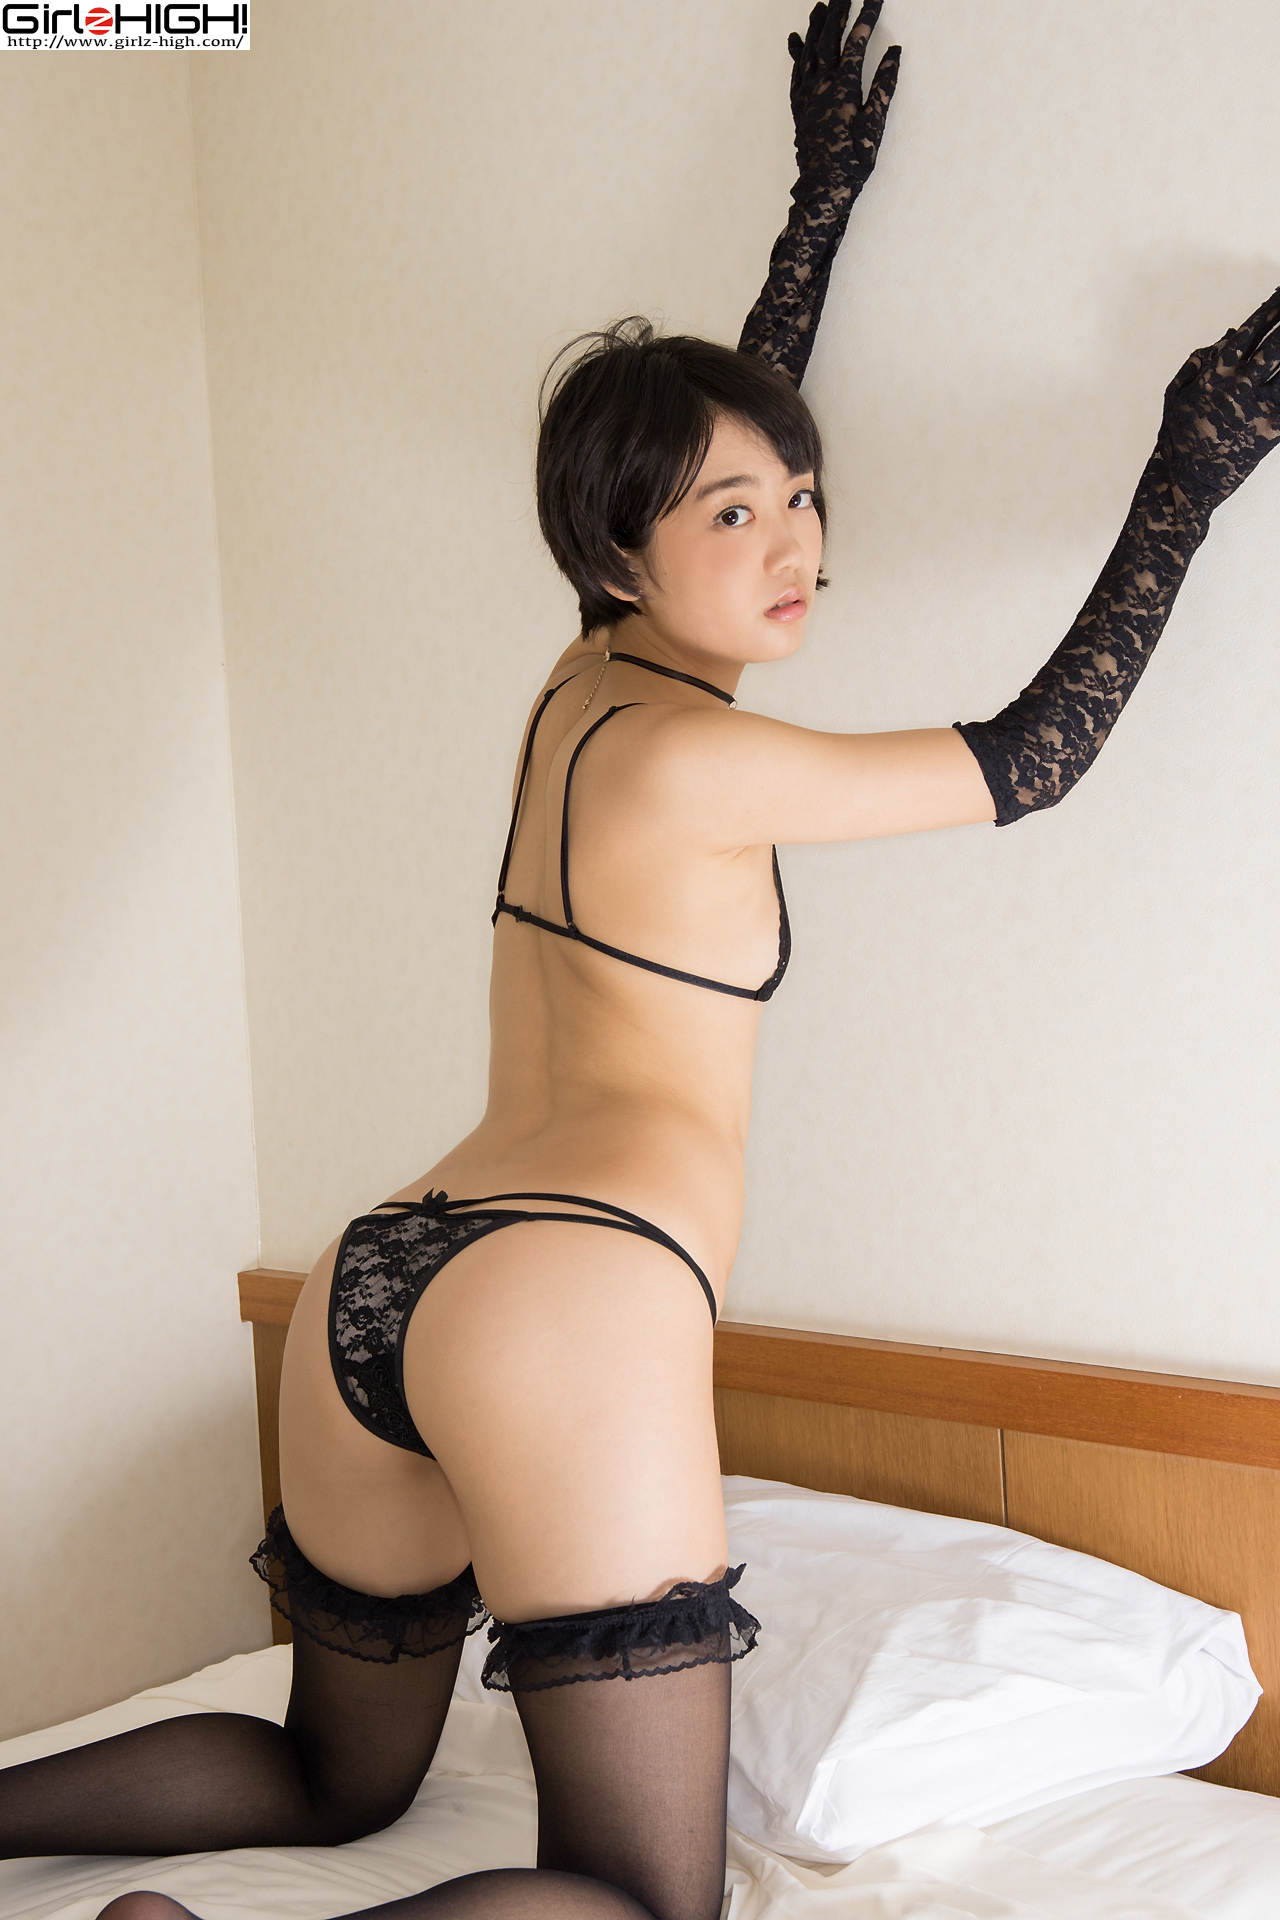 girl z high koharu koharu nishino girlz-high.com